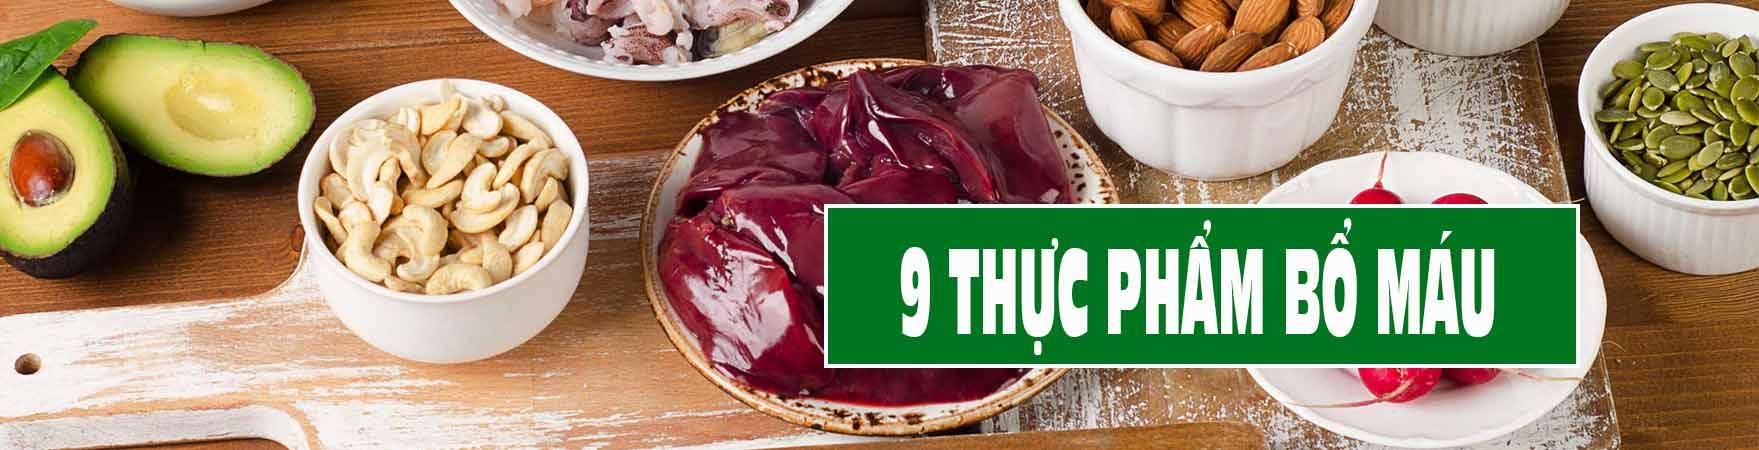 Thực phẩm bổ máu – Ăn gì bổ máu, bổ sung máu tốt